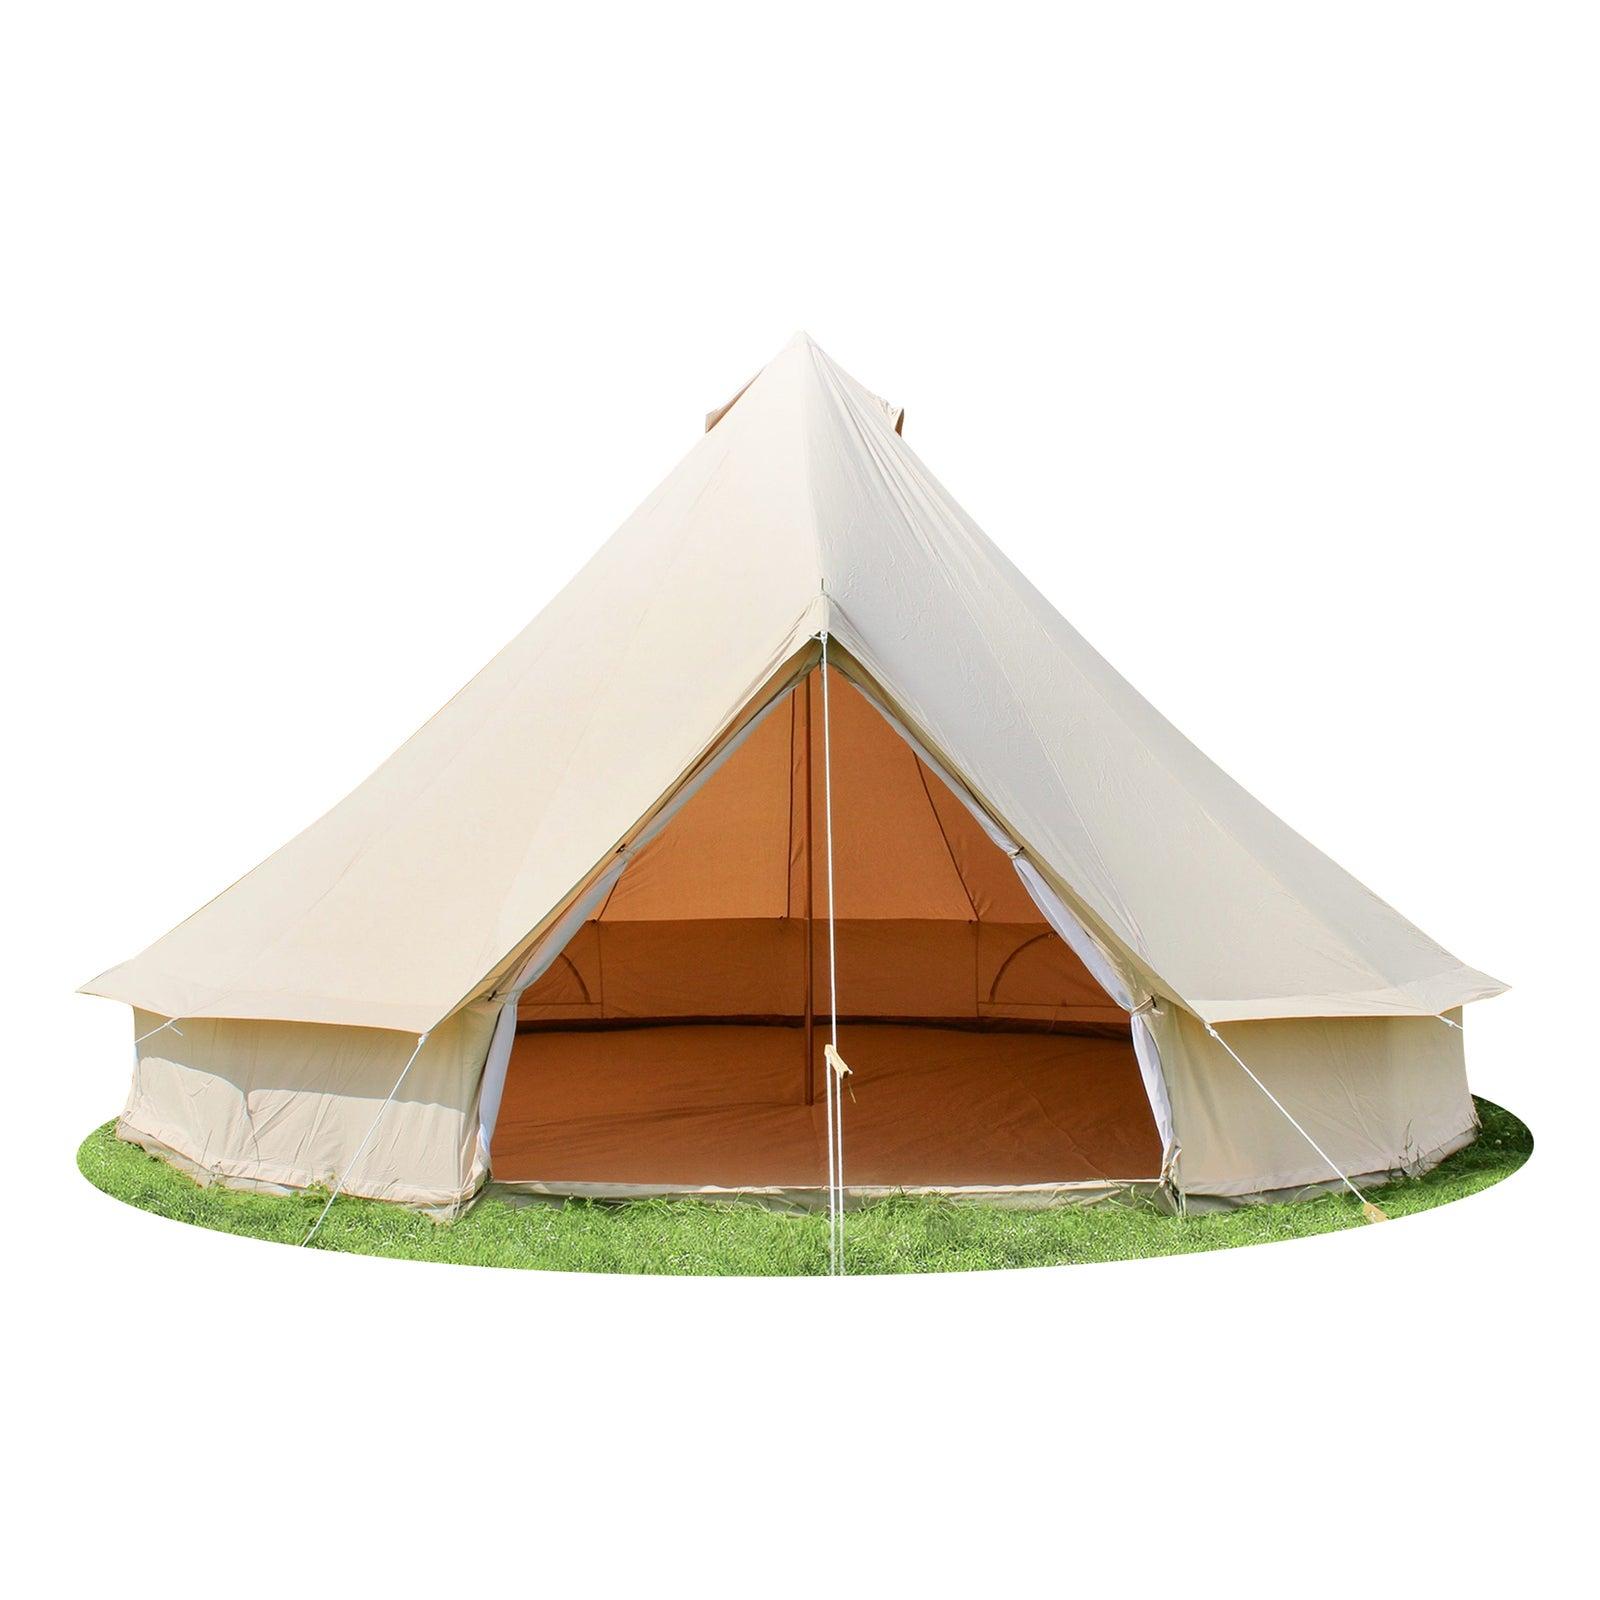 MIUZ 4-Season Bell Tent 3M 4M 5M 6M Waterproof Canvas belltent Glamping Yurt Teppee Tents